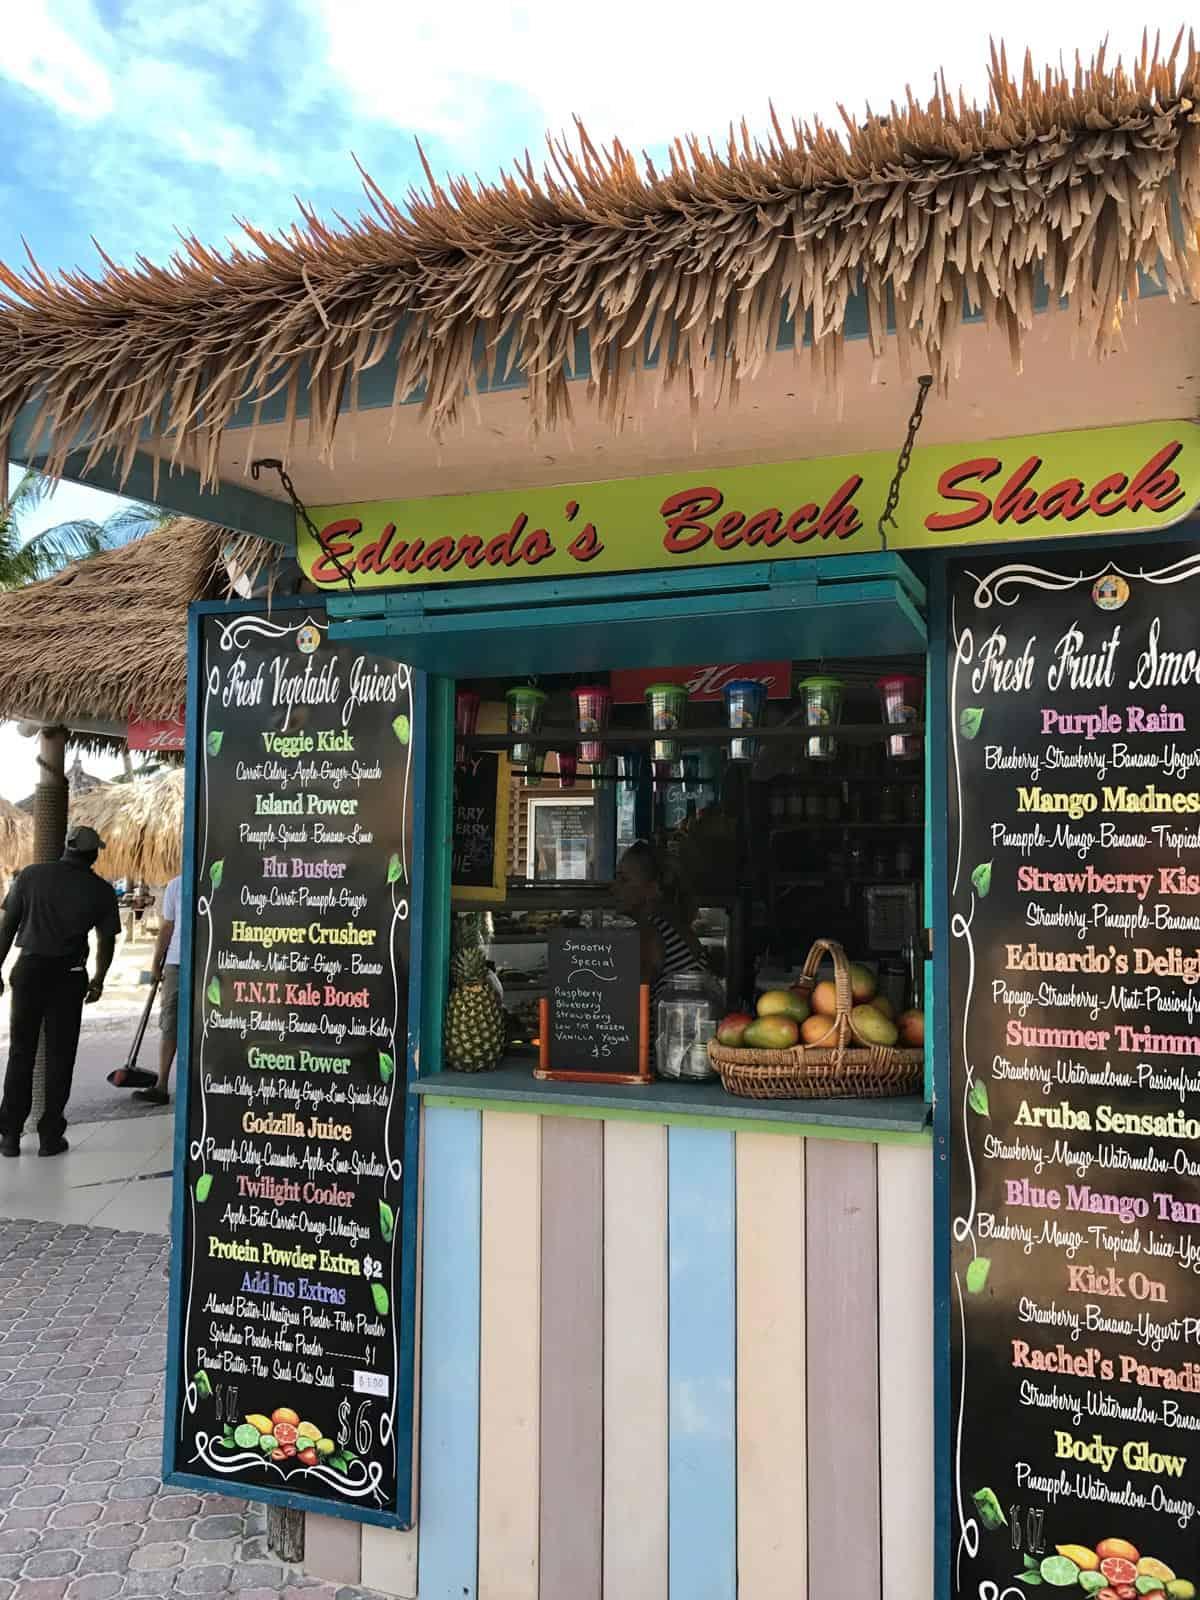 Aruba - Palm Beach - Eduardo's Beach Shack - from afarmgirlsdabbles.com